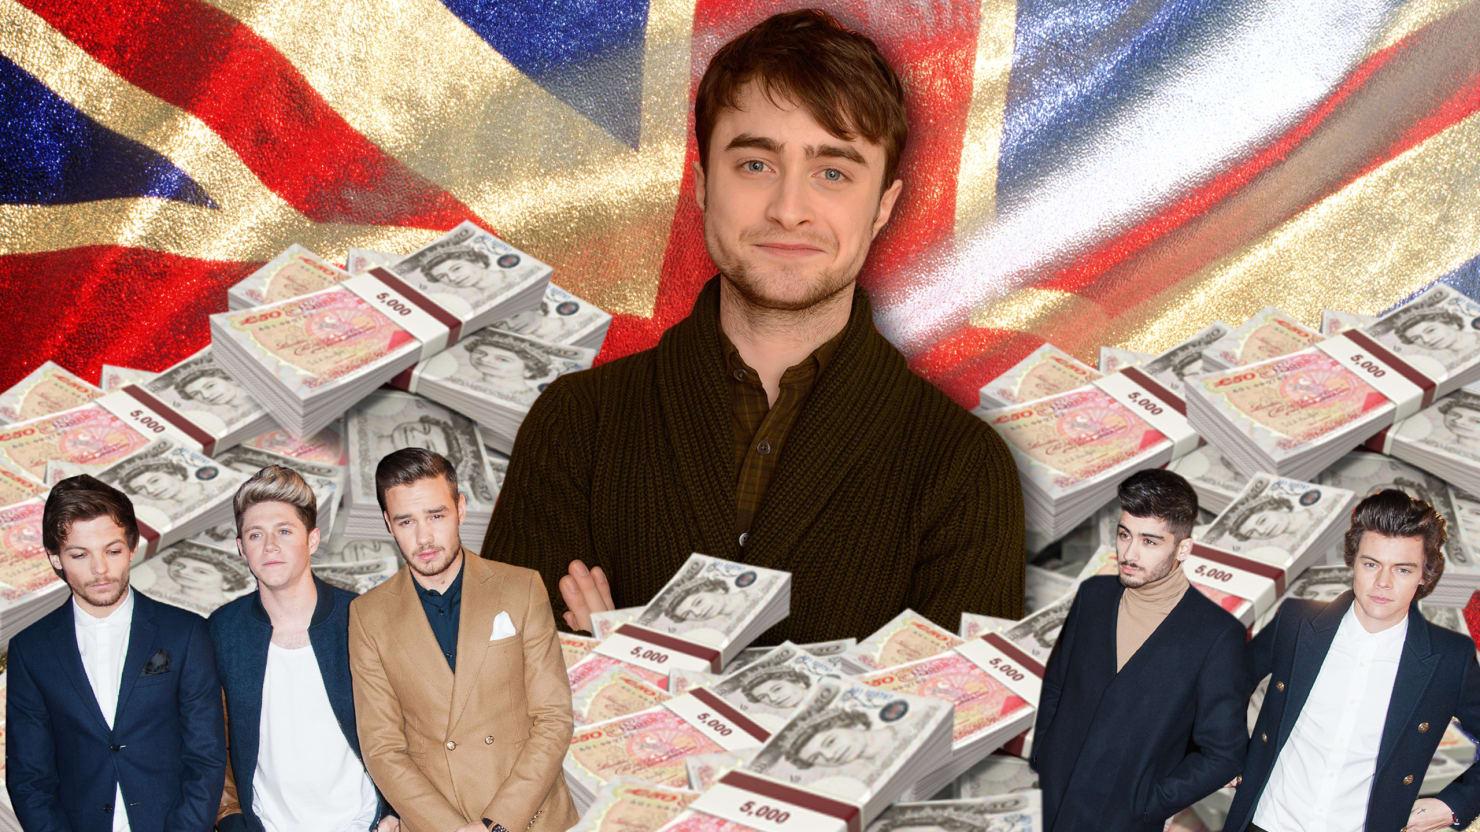 Daniel Radcliffe: I'm Richer Than One Direction